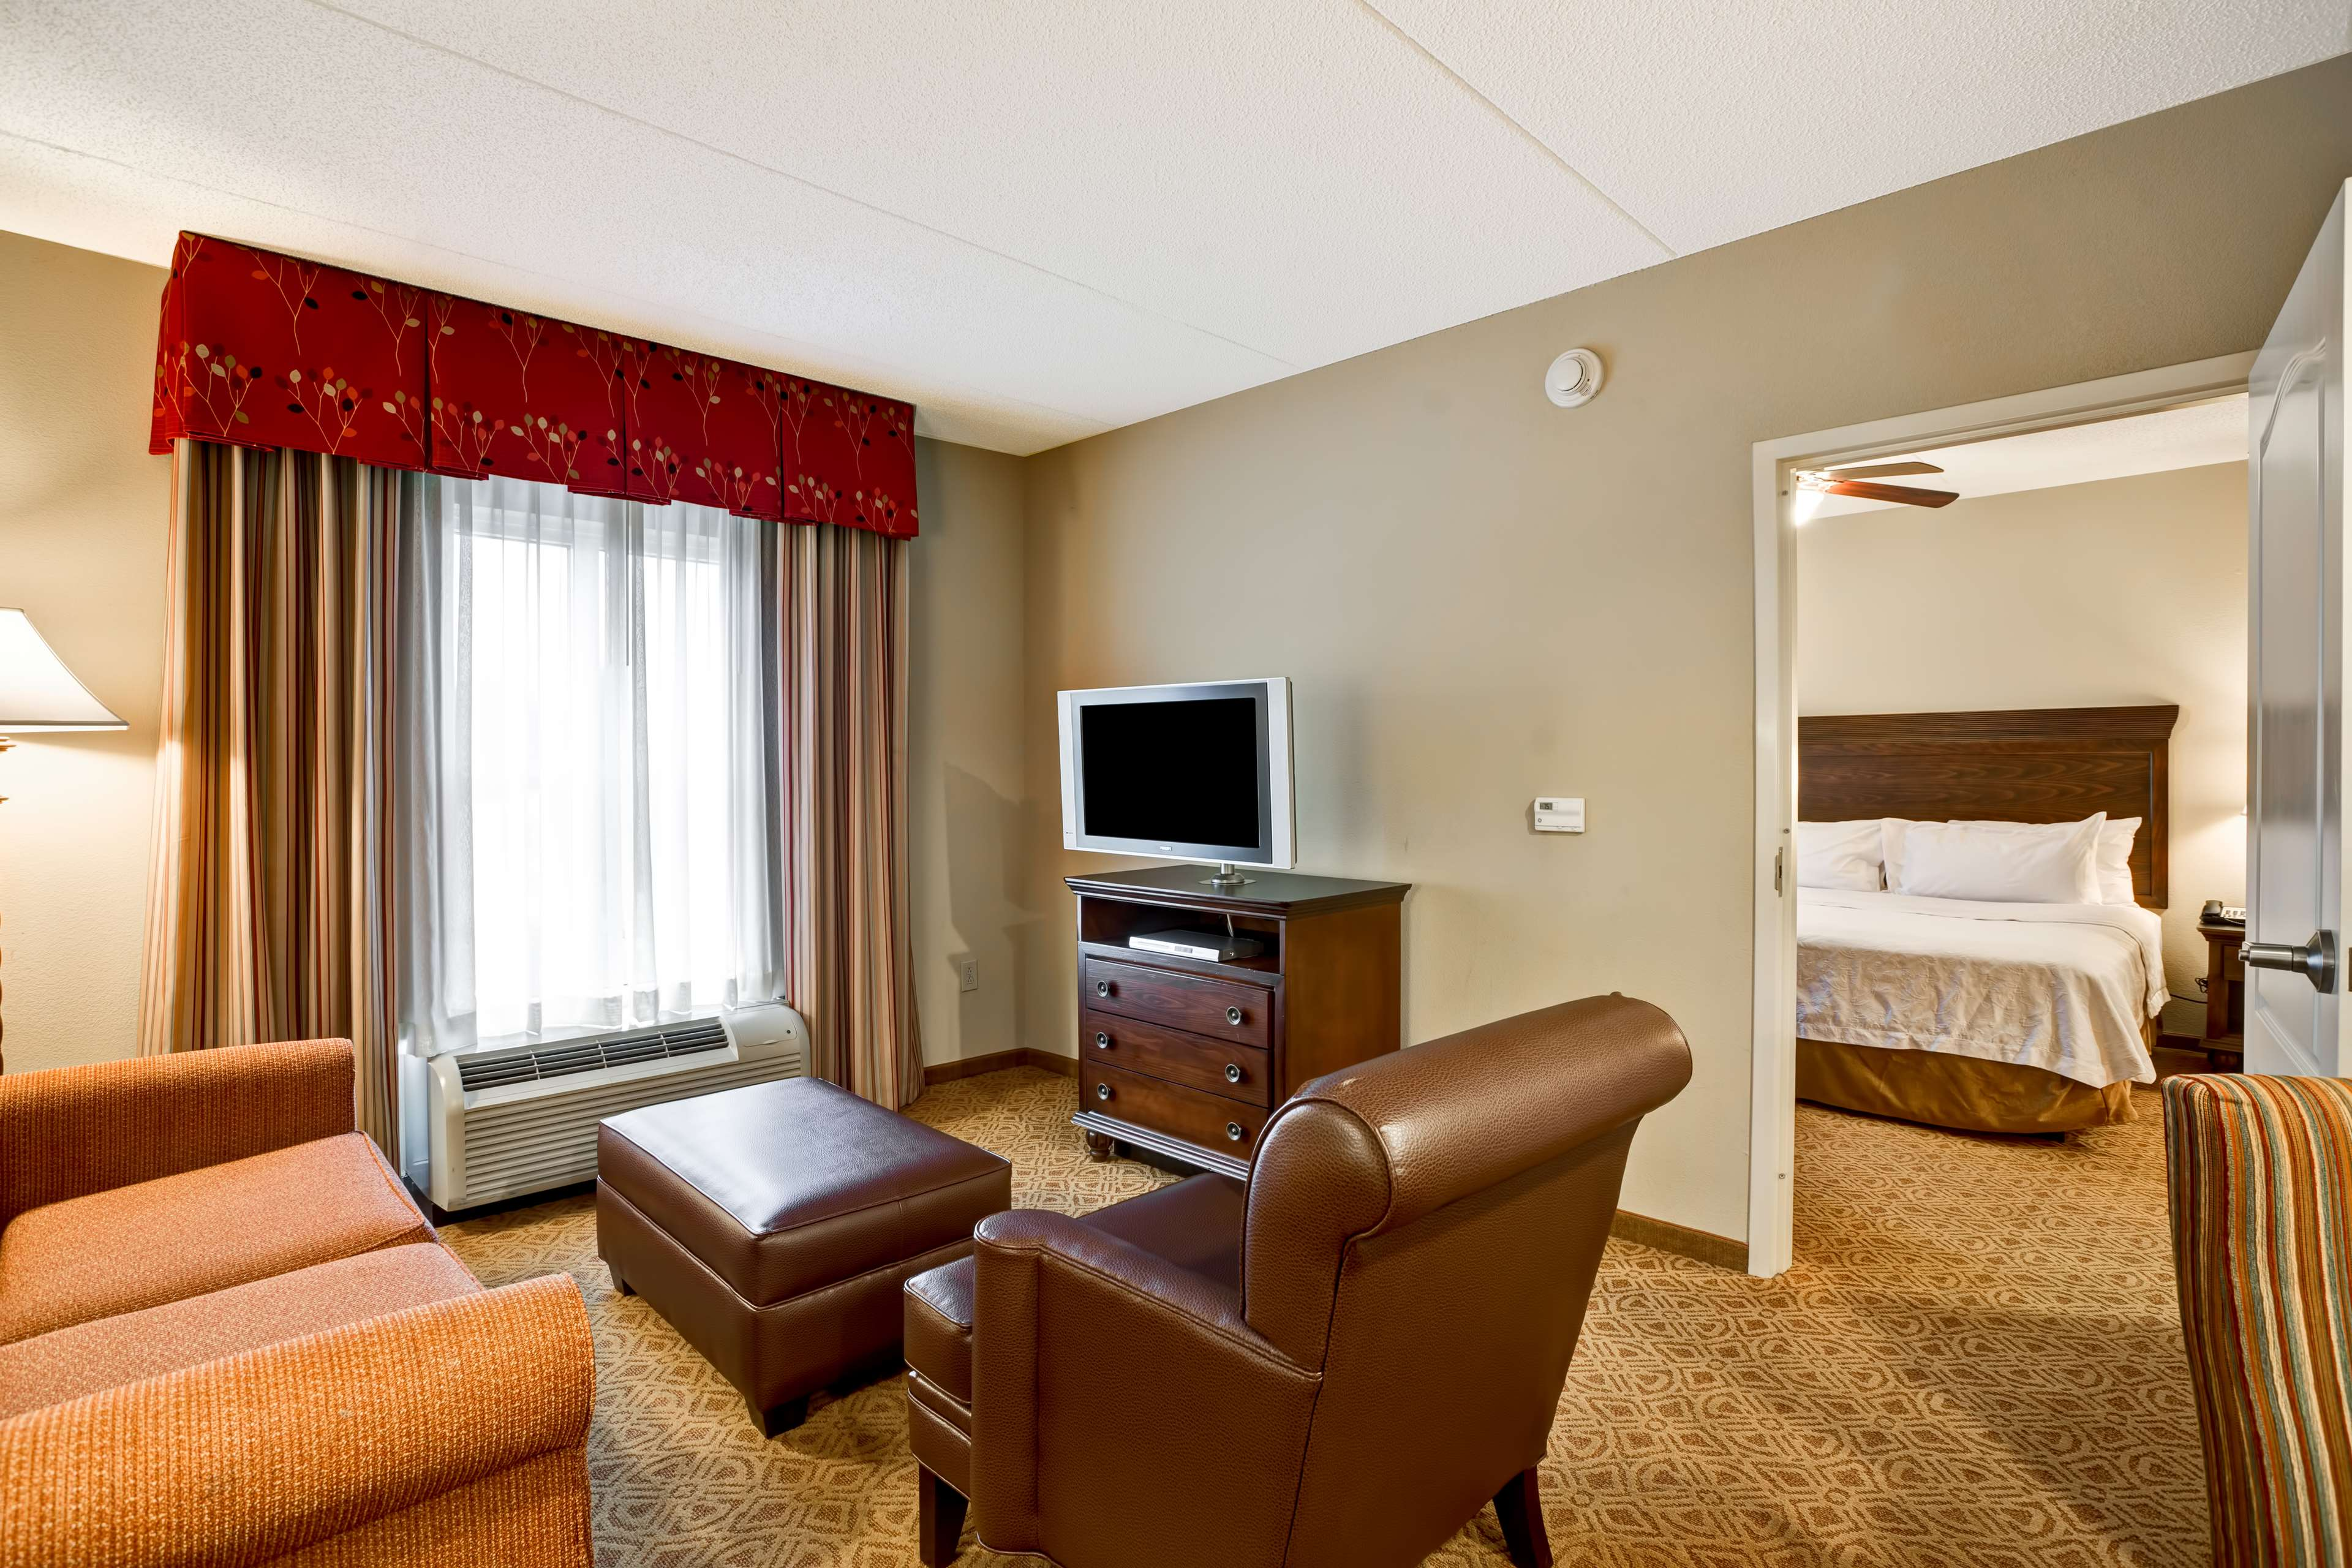 Homewood Suites by Hilton Fredericksburg image 27